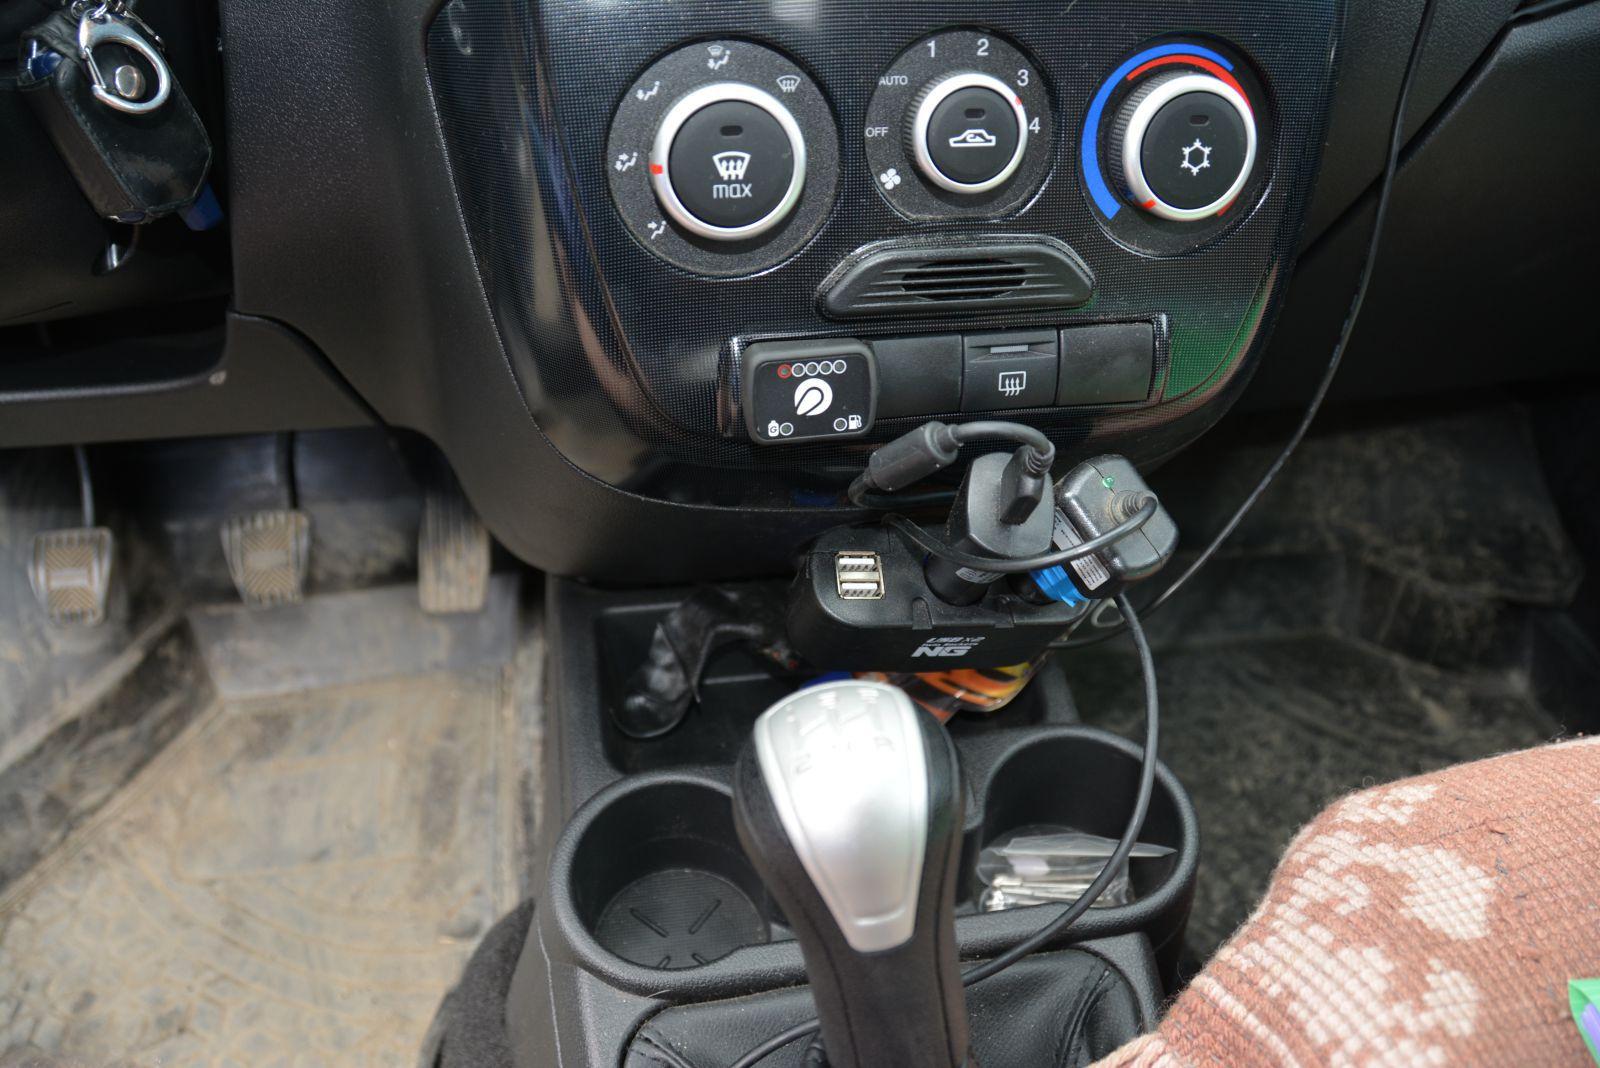 Кнопка переключения газ/бензин установлена в салон автомобиля